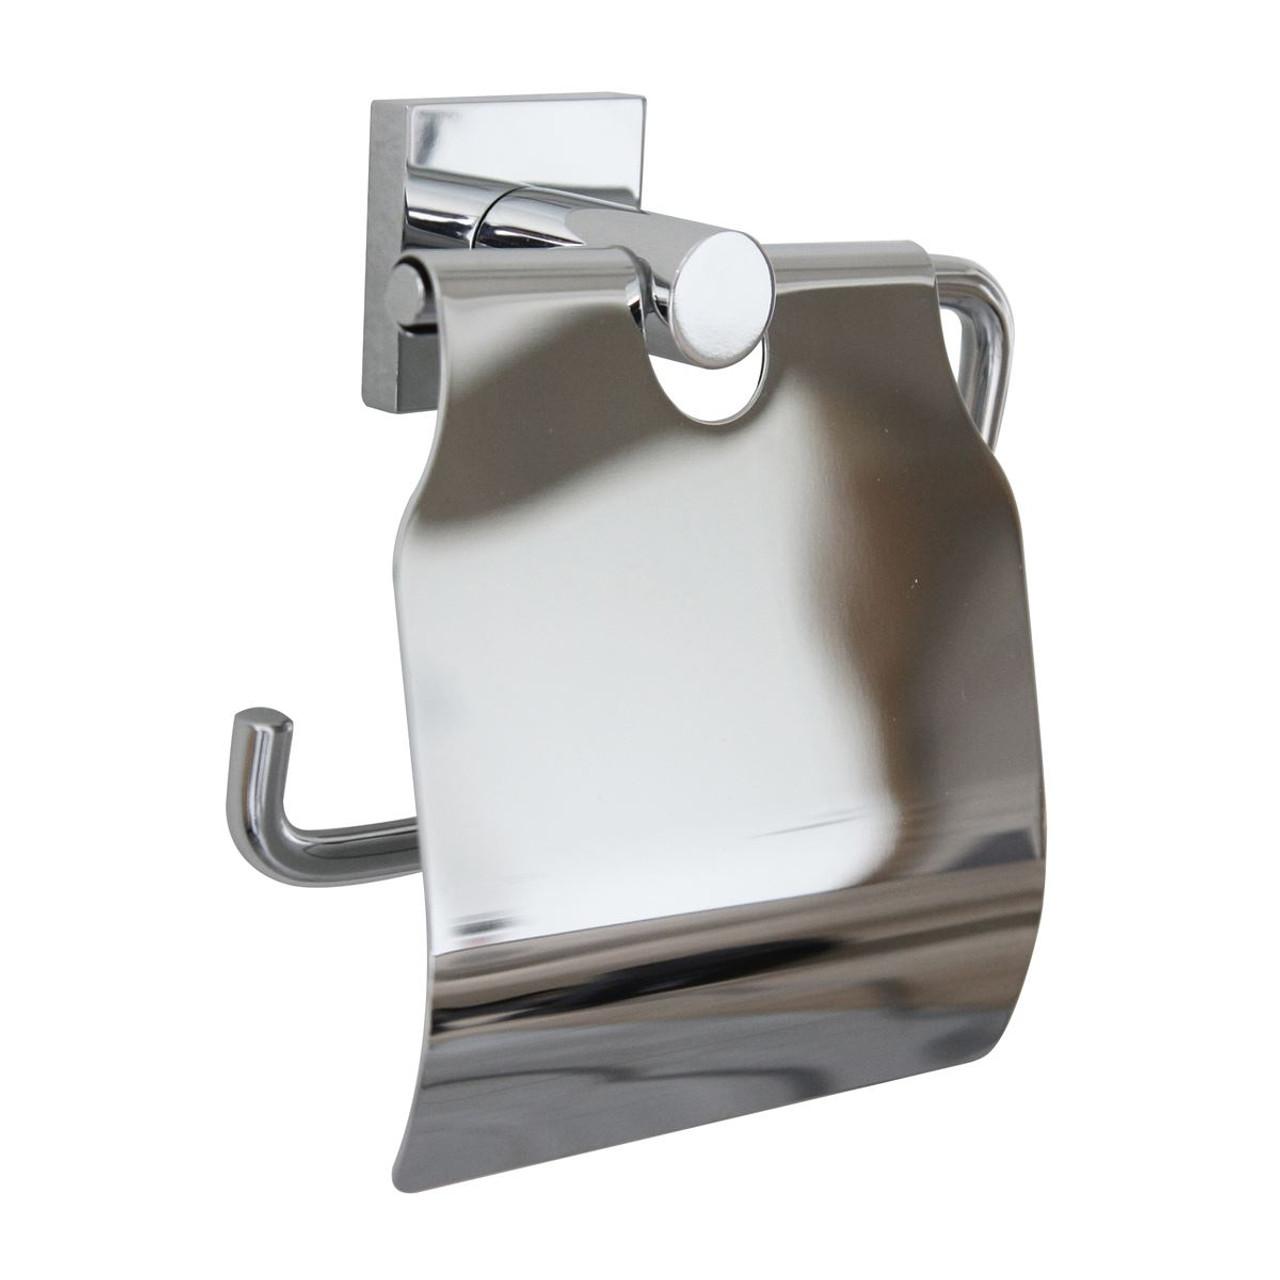 Miller Atlanta Toilet Roll Holder With Lid